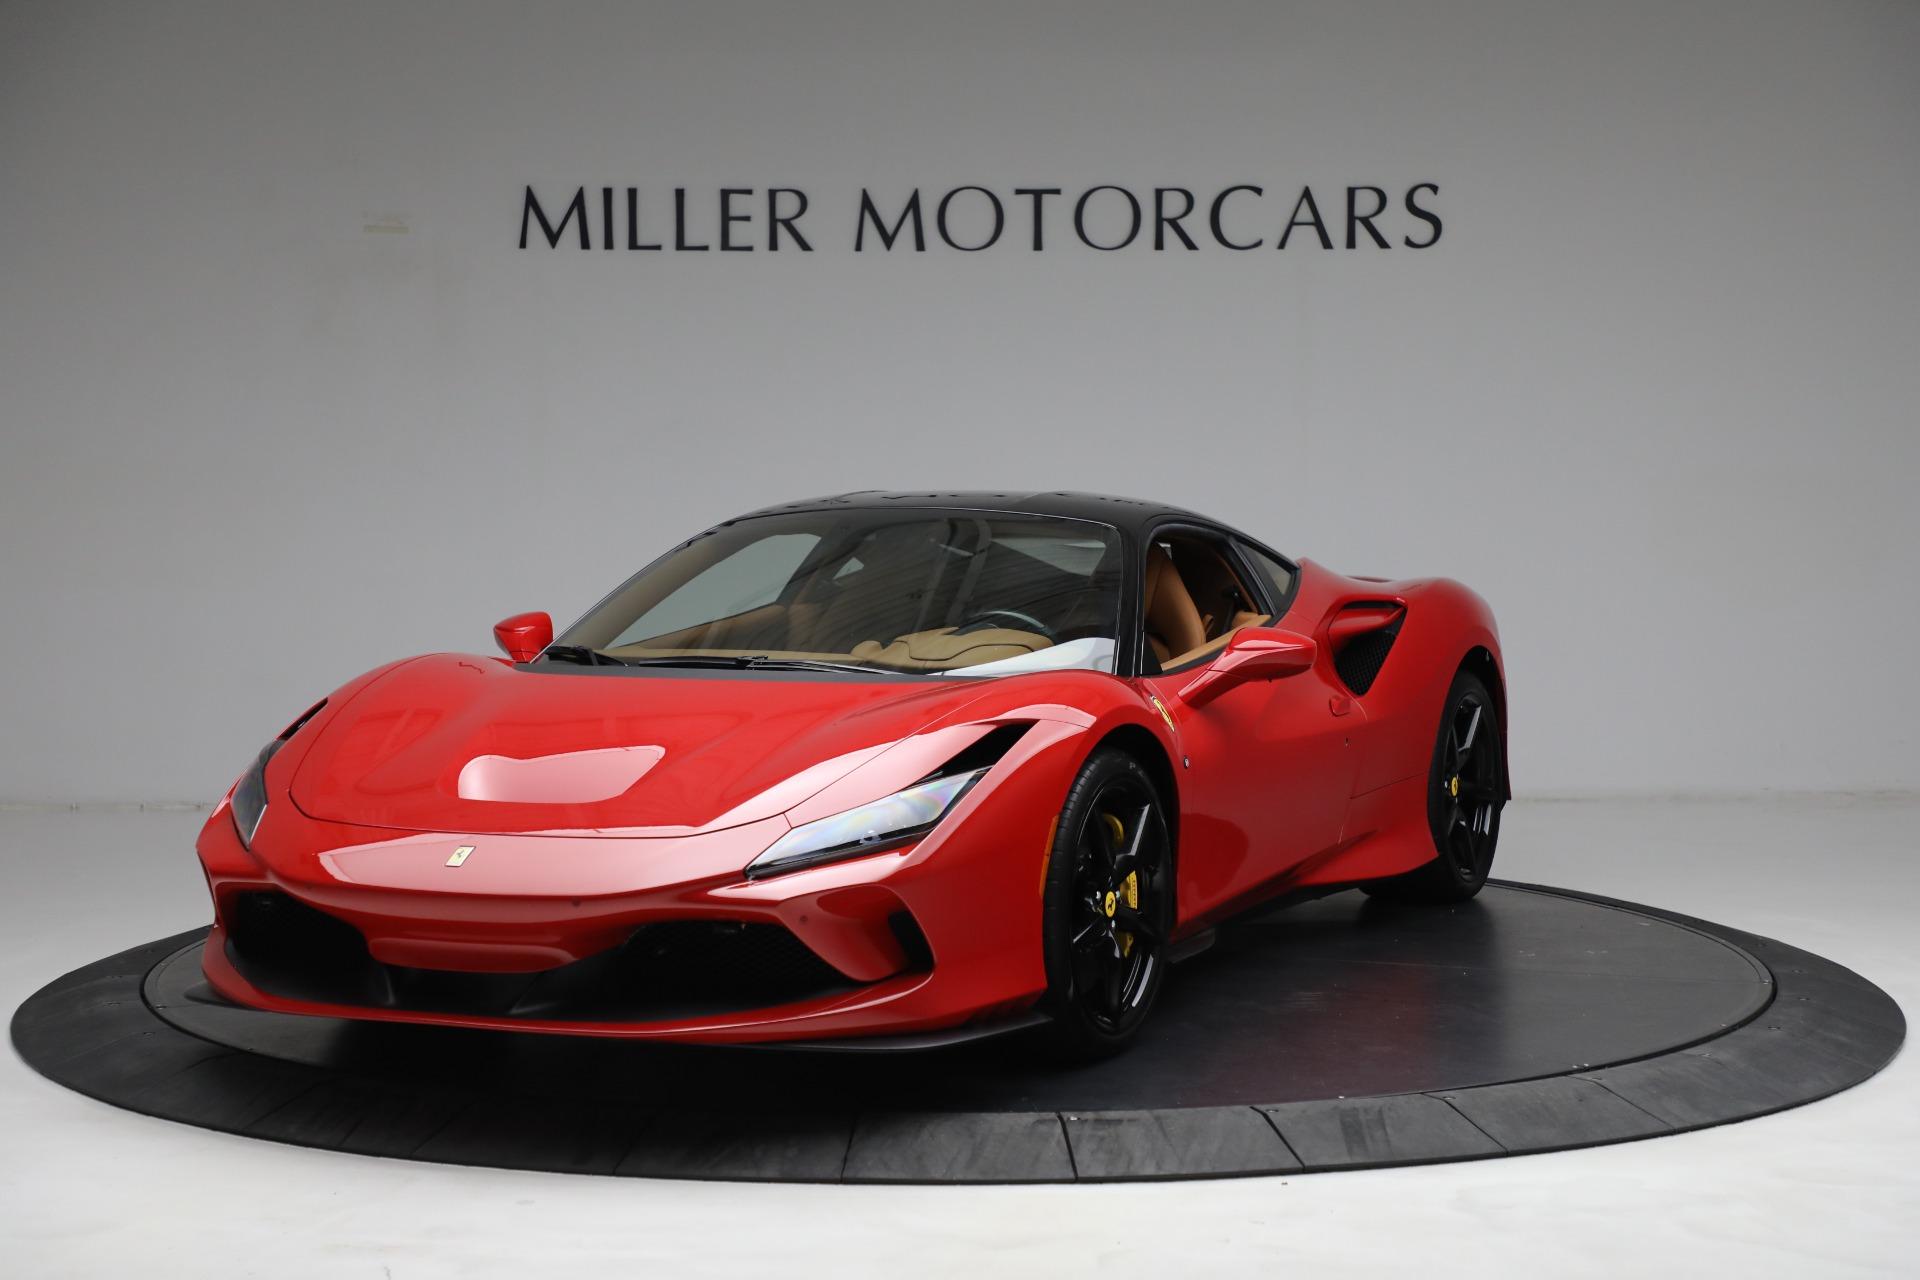 Used 2021 Ferrari F8 Tributo for sale Call for price at Maserati of Greenwich in Greenwich CT 06830 1